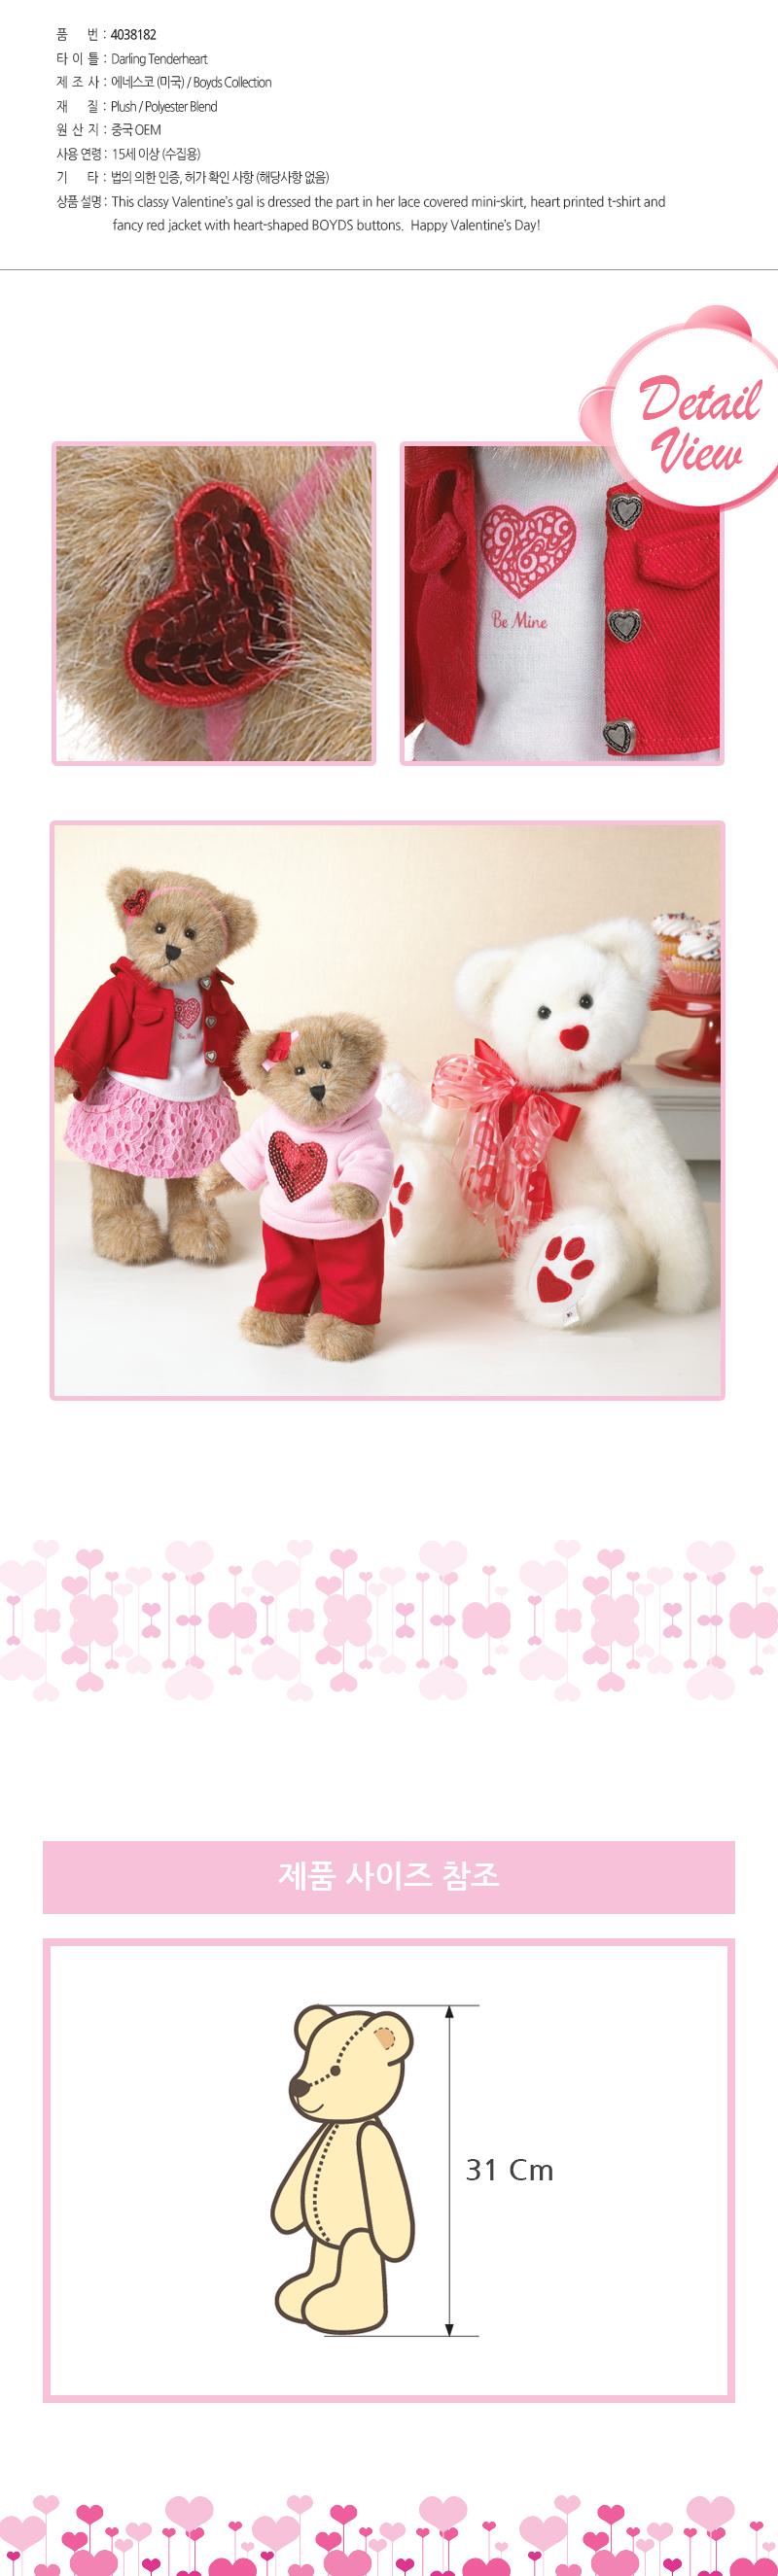 Valentines TeddyBear52,000원-보이즈테디베어키덜트/취미, 패브릭인형, 캐릭터인형, 테디베어바보사랑Valentines TeddyBear52,000원-보이즈테디베어키덜트/취미, 패브릭인형, 캐릭터인형, 테디베어바보사랑